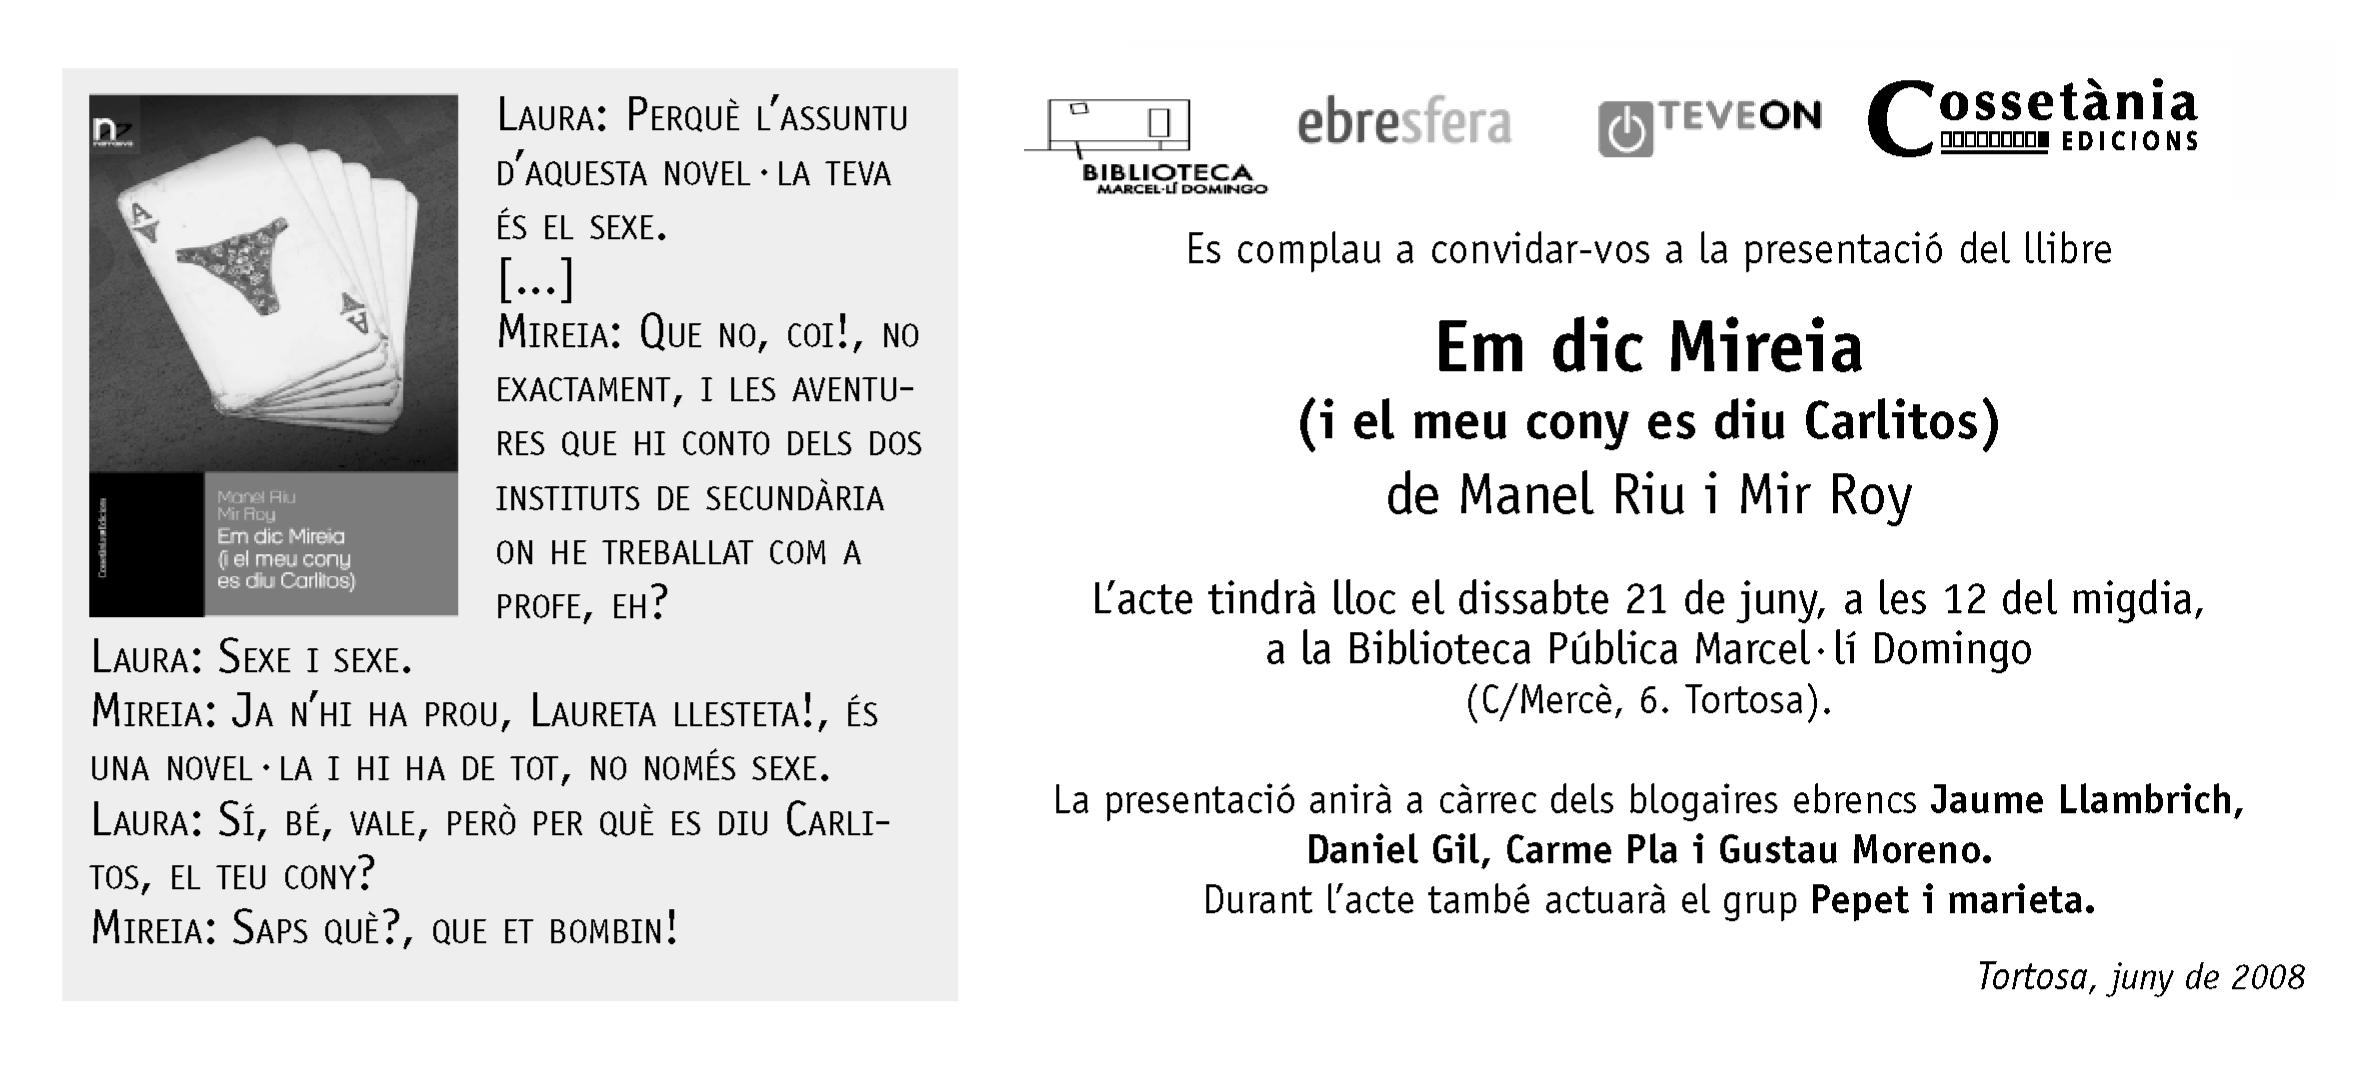 Targetó presentació Mireia a Tortosa